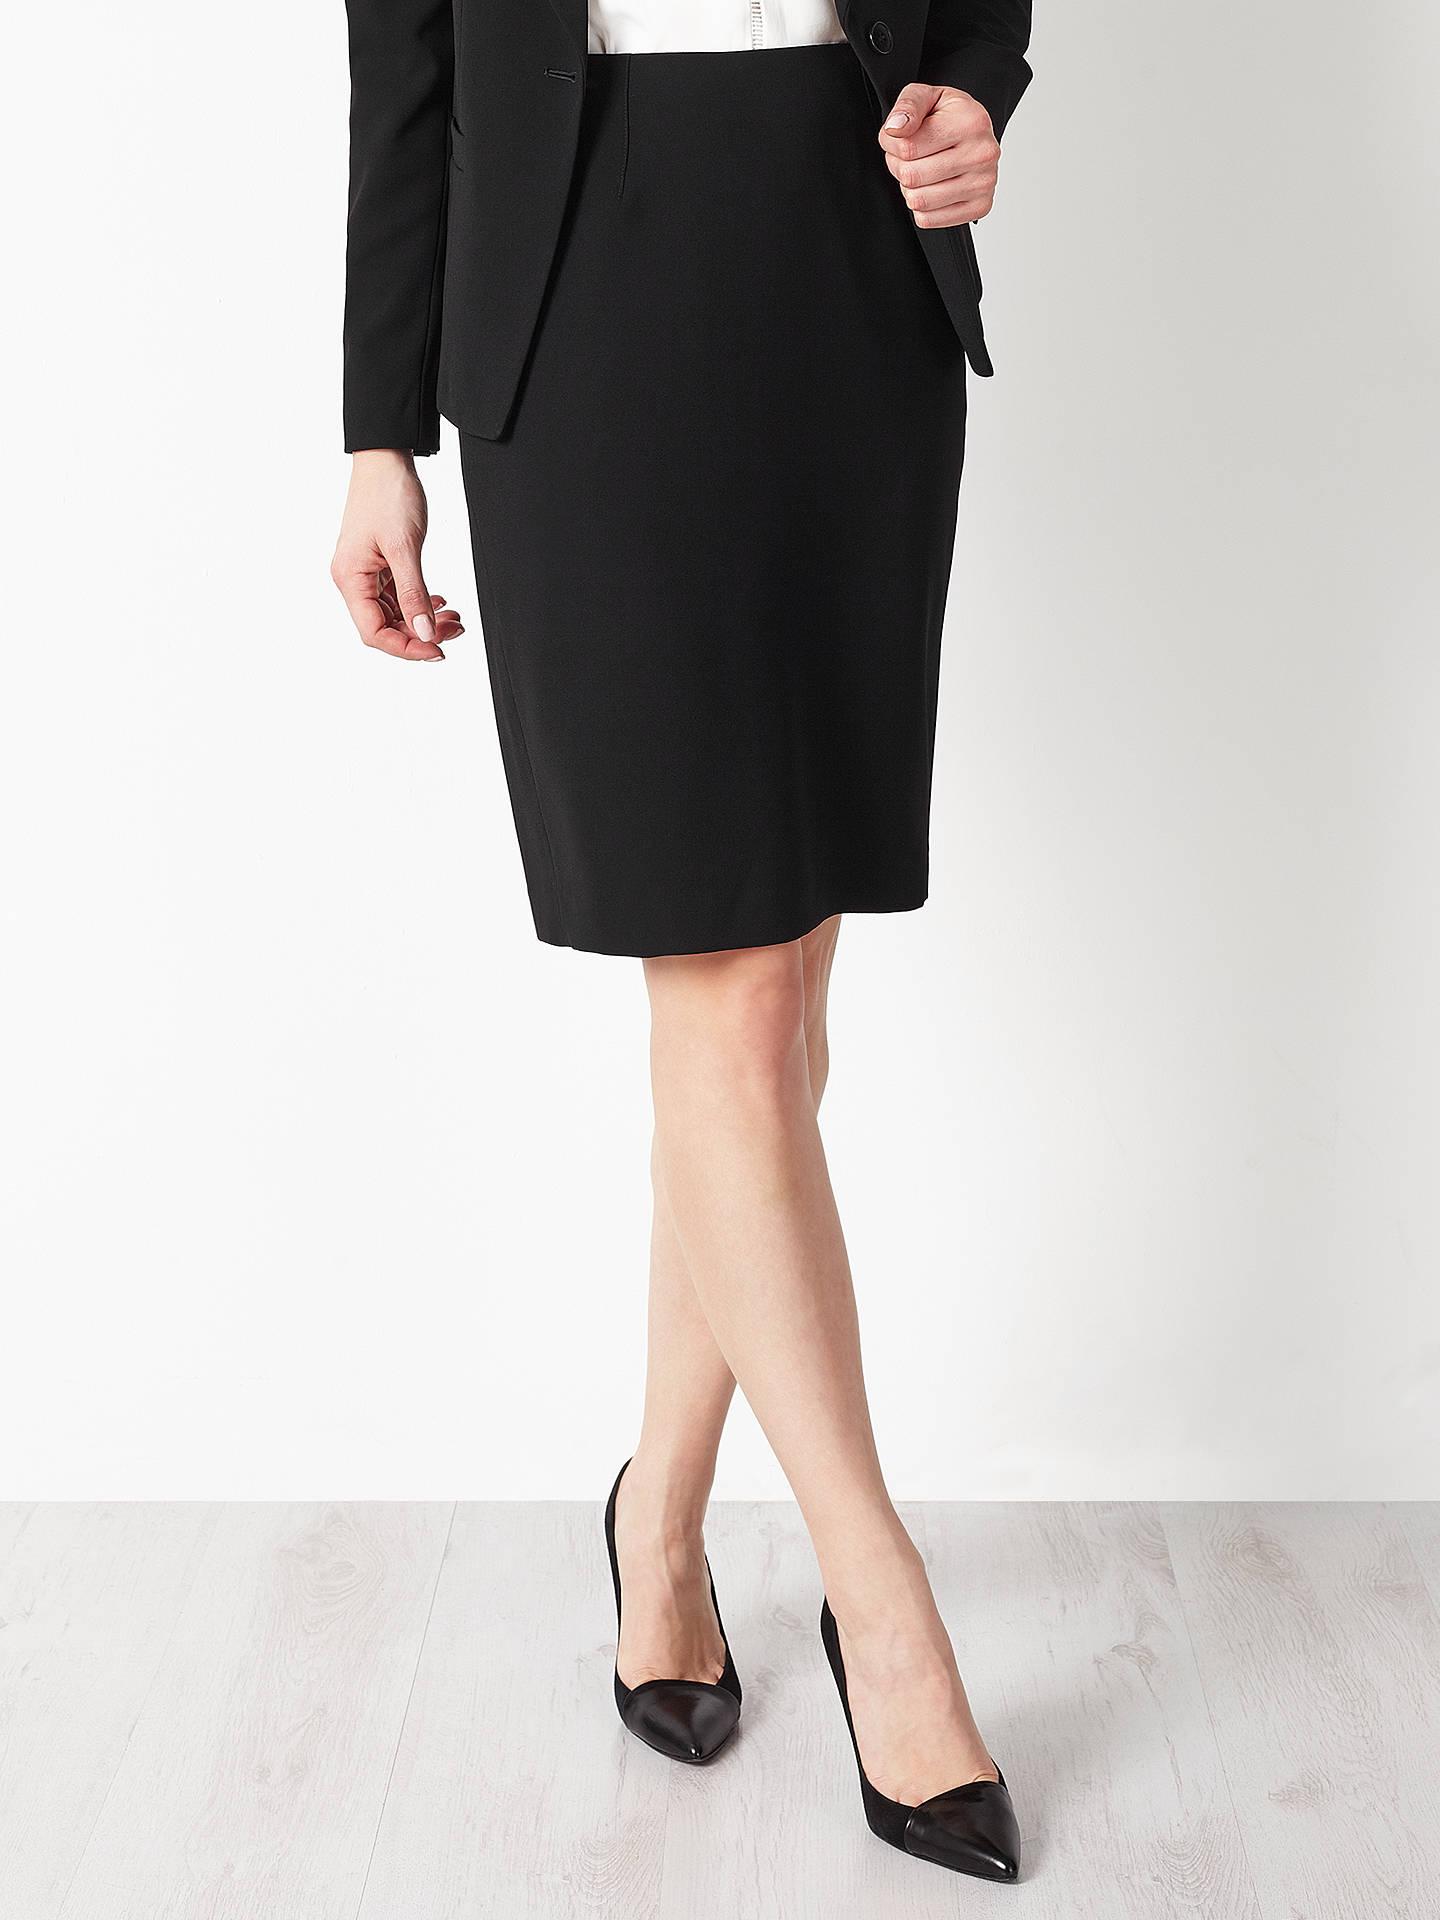 BuyJohn Lewis u0026 Partners Eva Crepe Skirt